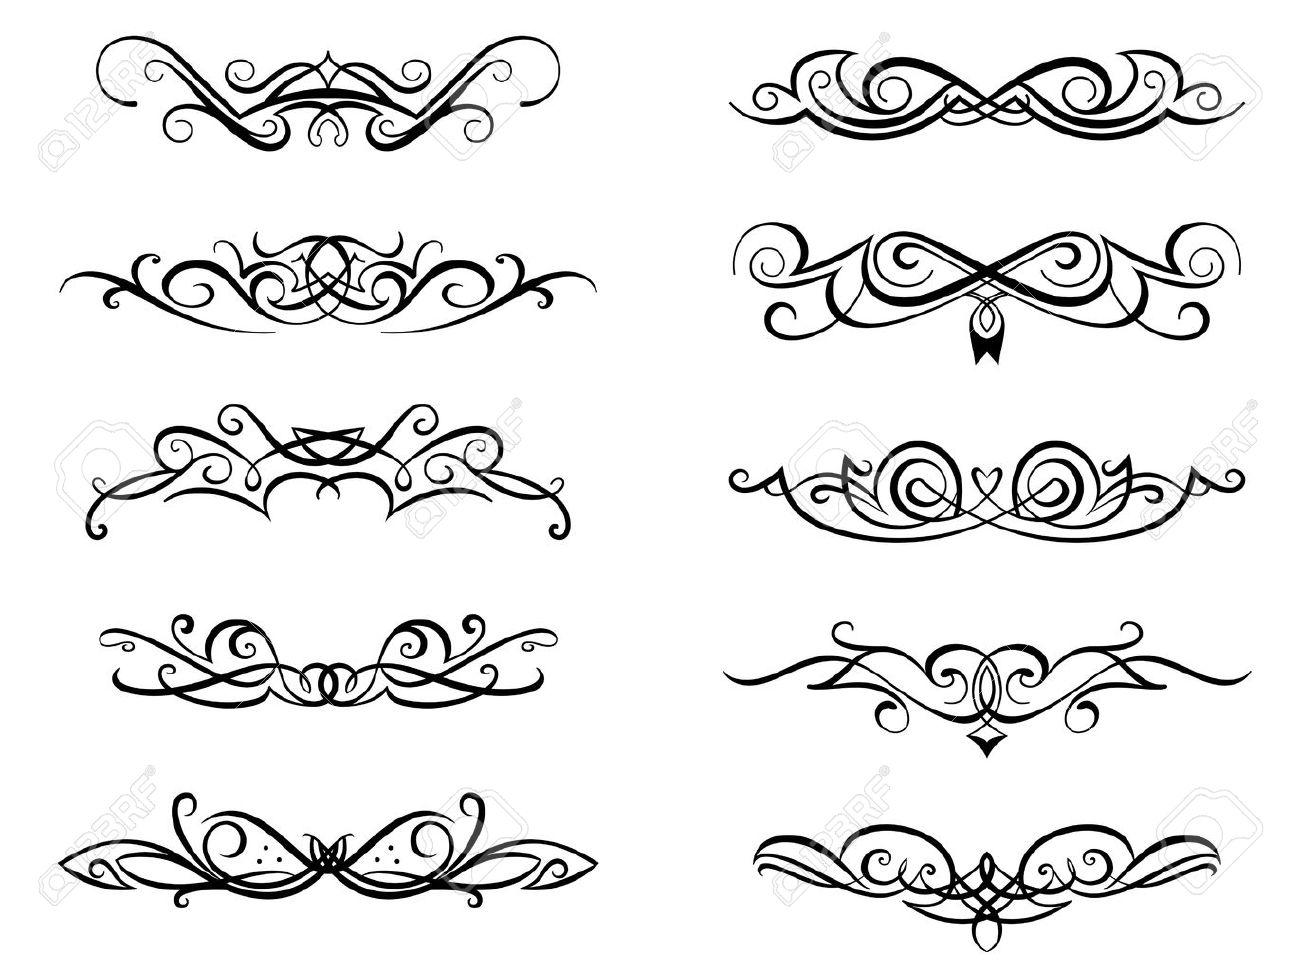 Vignettes And Monograms Set In Vintage Floral Style For Design ...